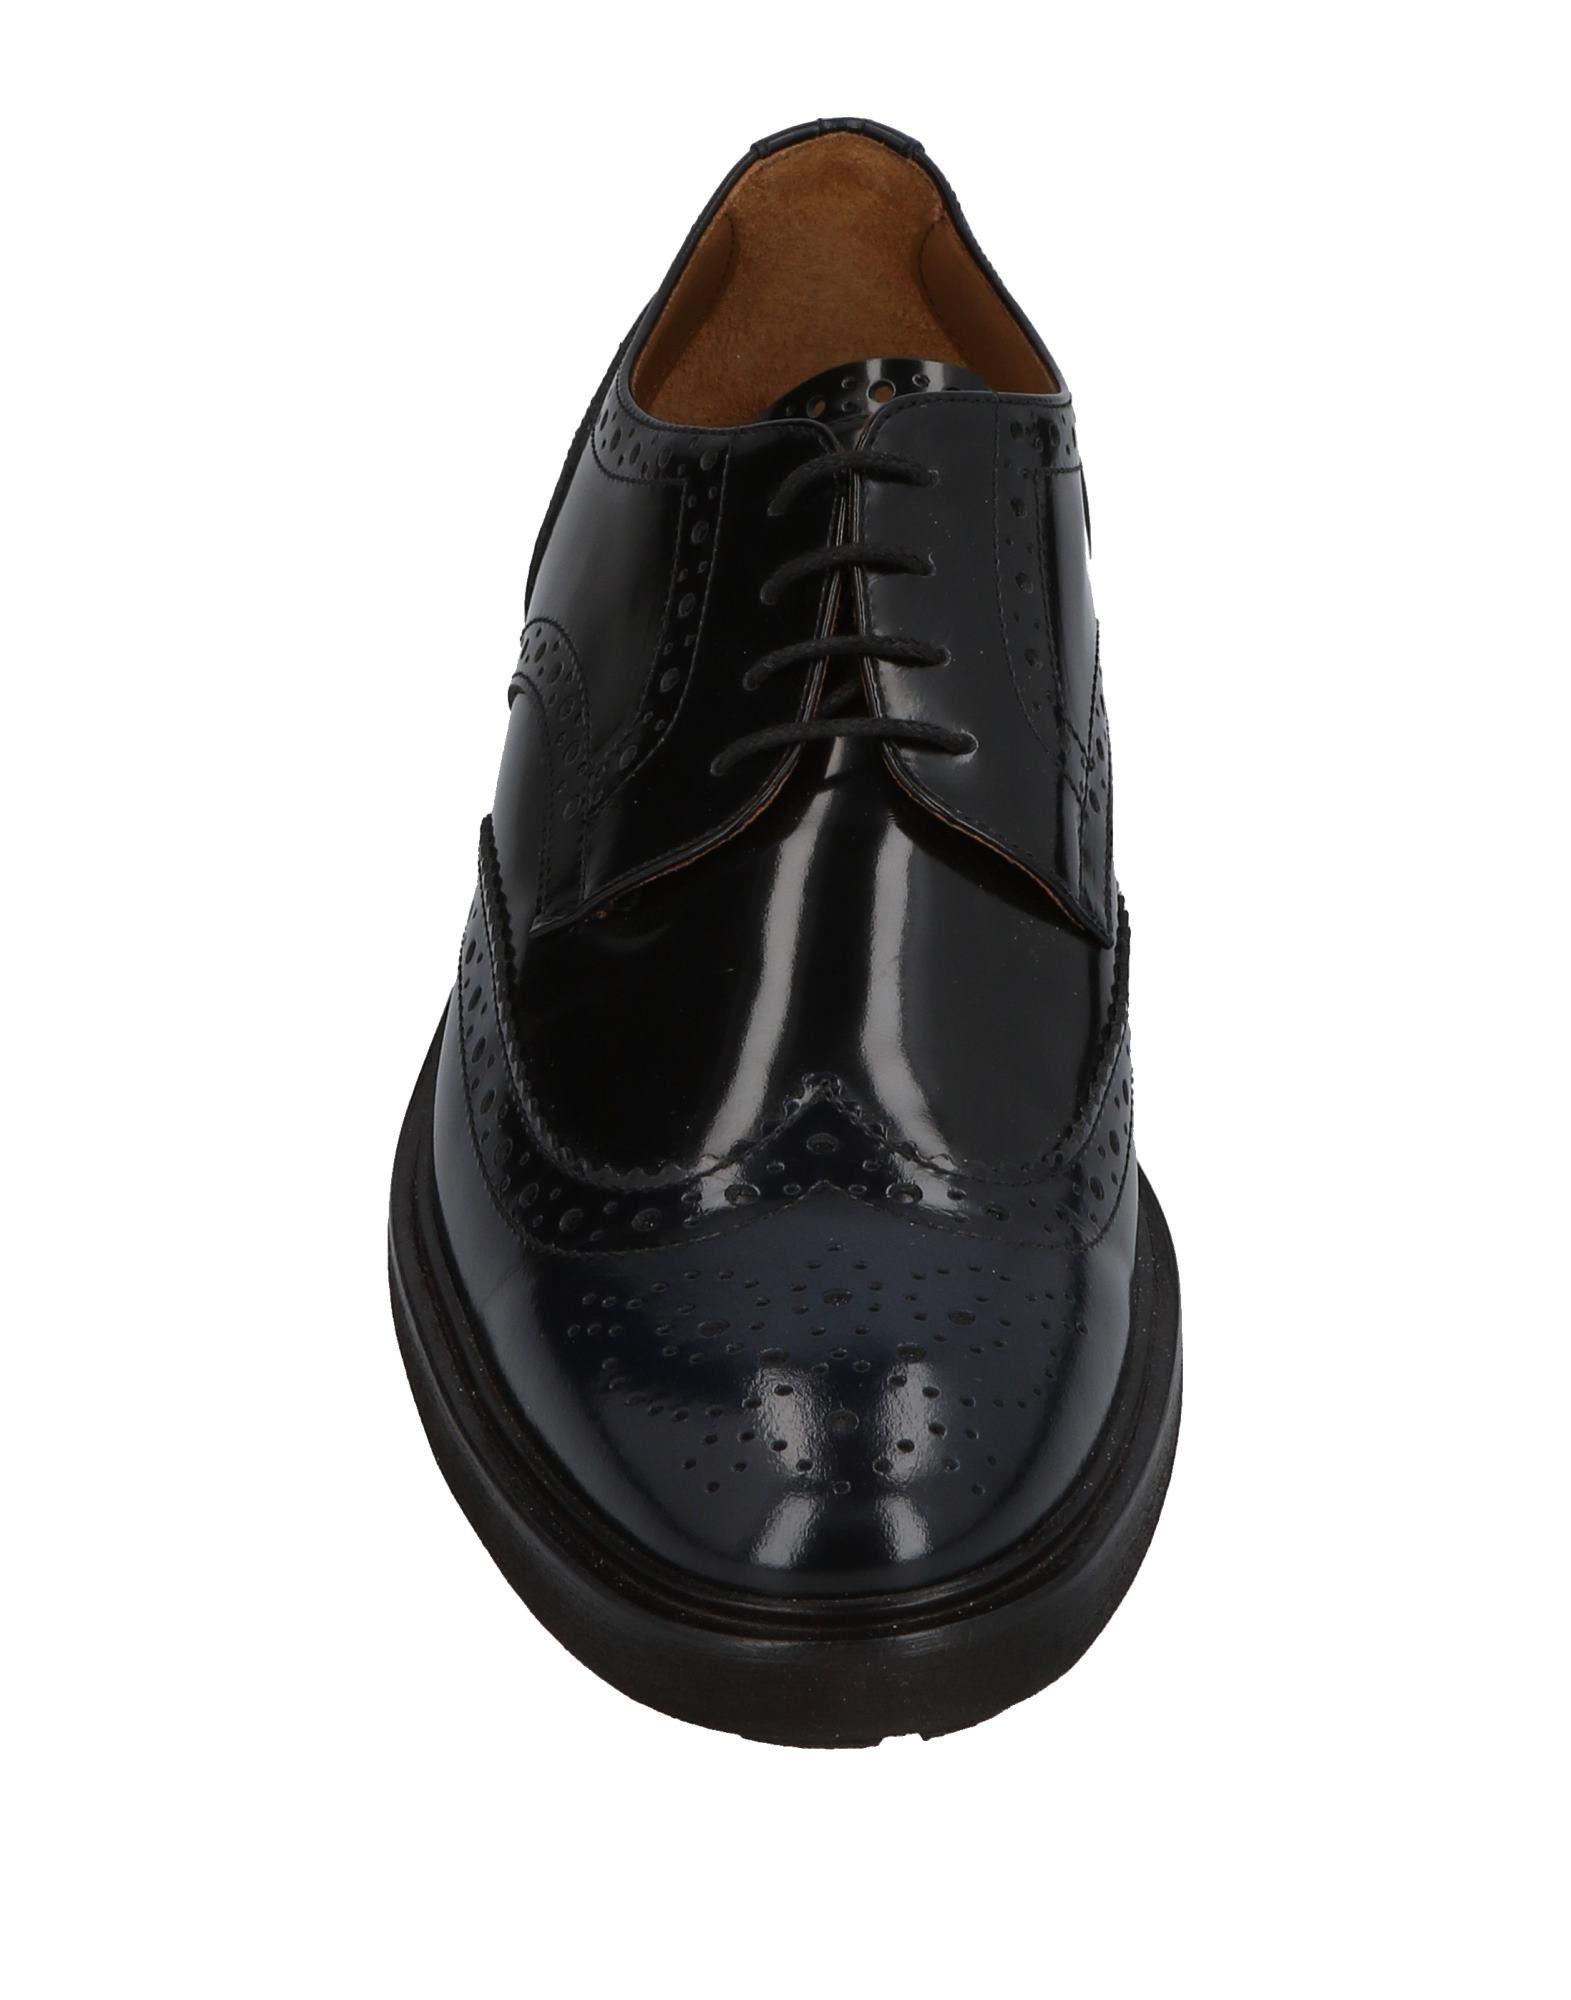 Mauro Ferrini Schnürschuhe Qualität Damen  11460184RF Gute Qualität Schnürschuhe beliebte Schuhe 320f26